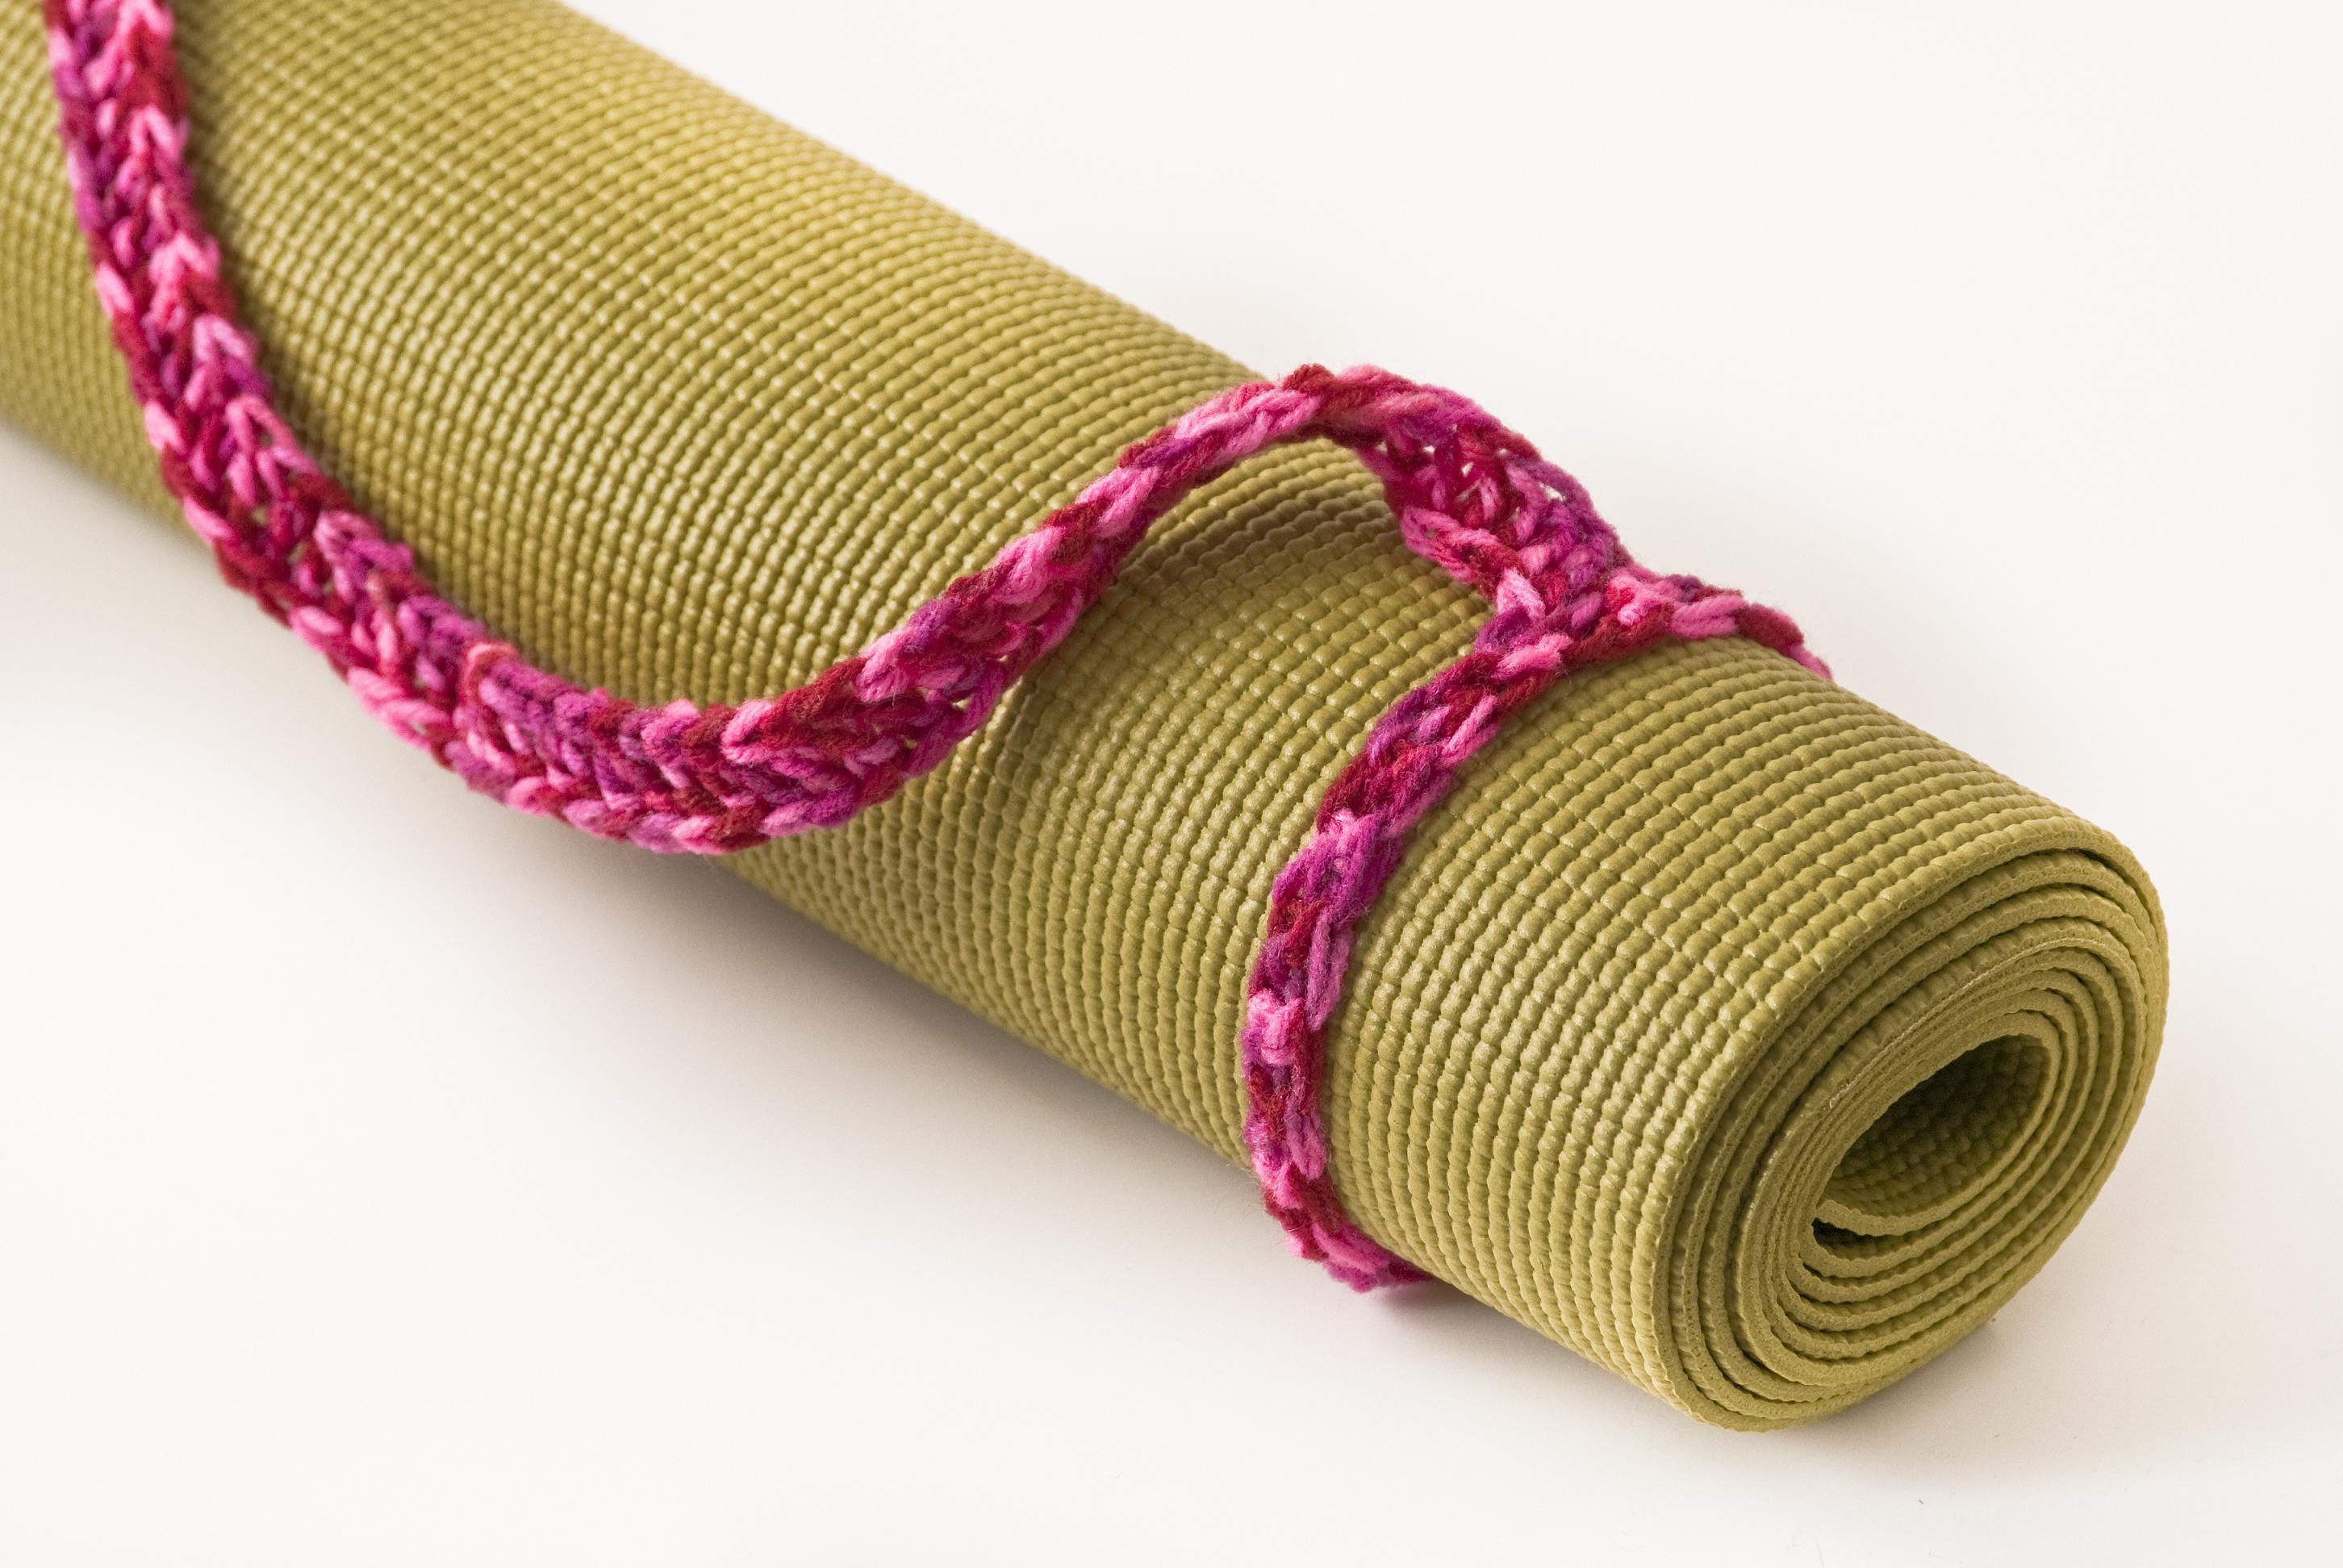 bright hand mat mats appliqued yoga soulie buddhibox straps product pink sling ribbon